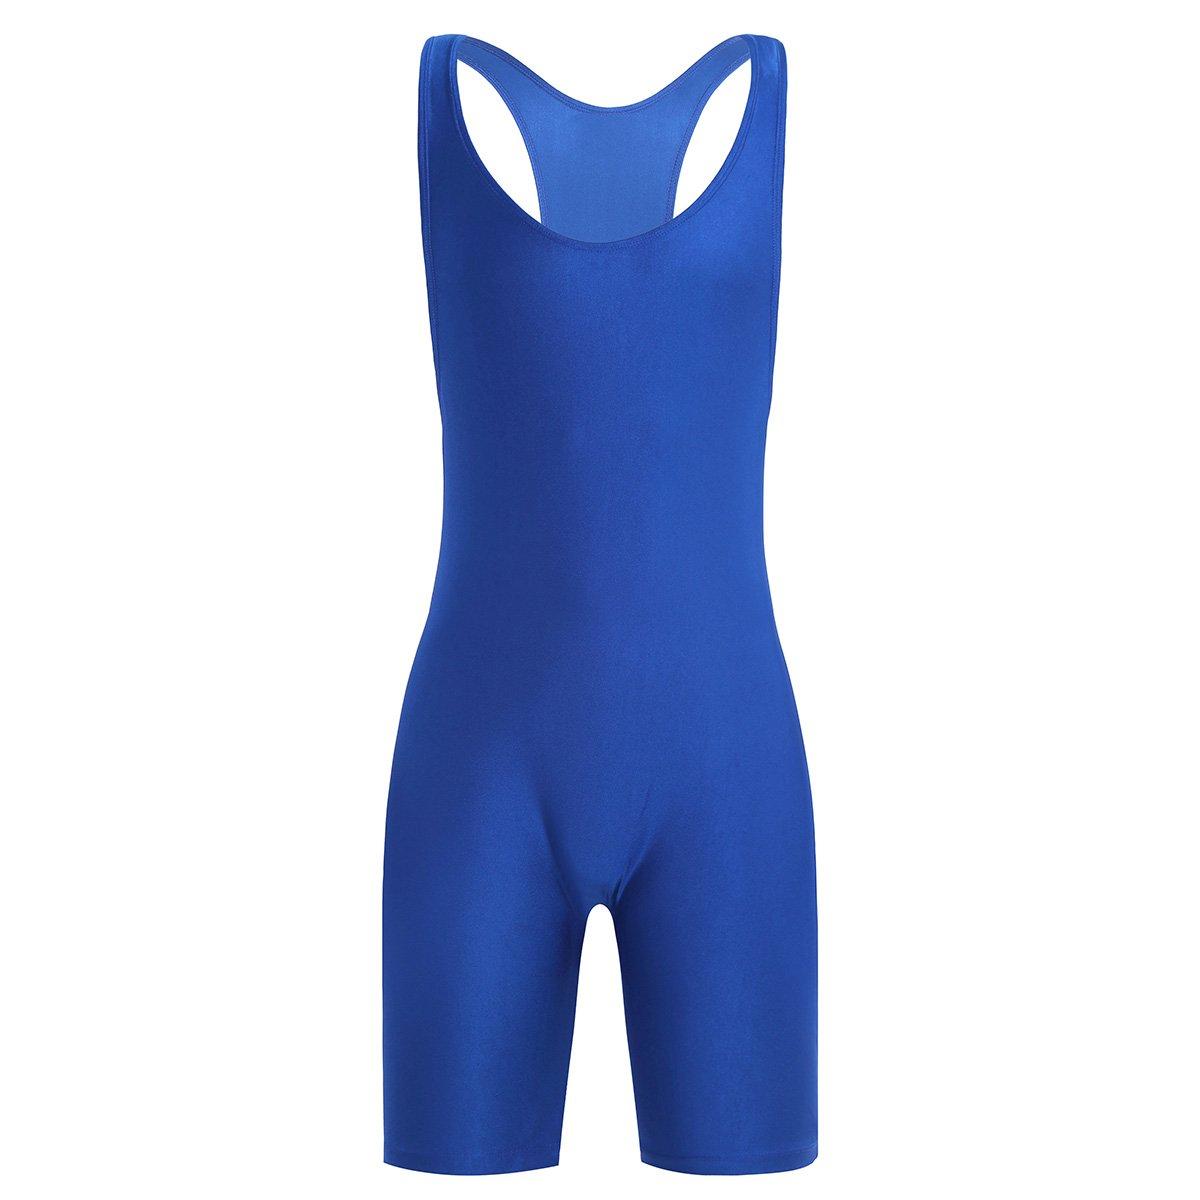 TiaoBug Men's Wrestling Singlet One-Piece Sleeveless Leotard Gym Bodysuit